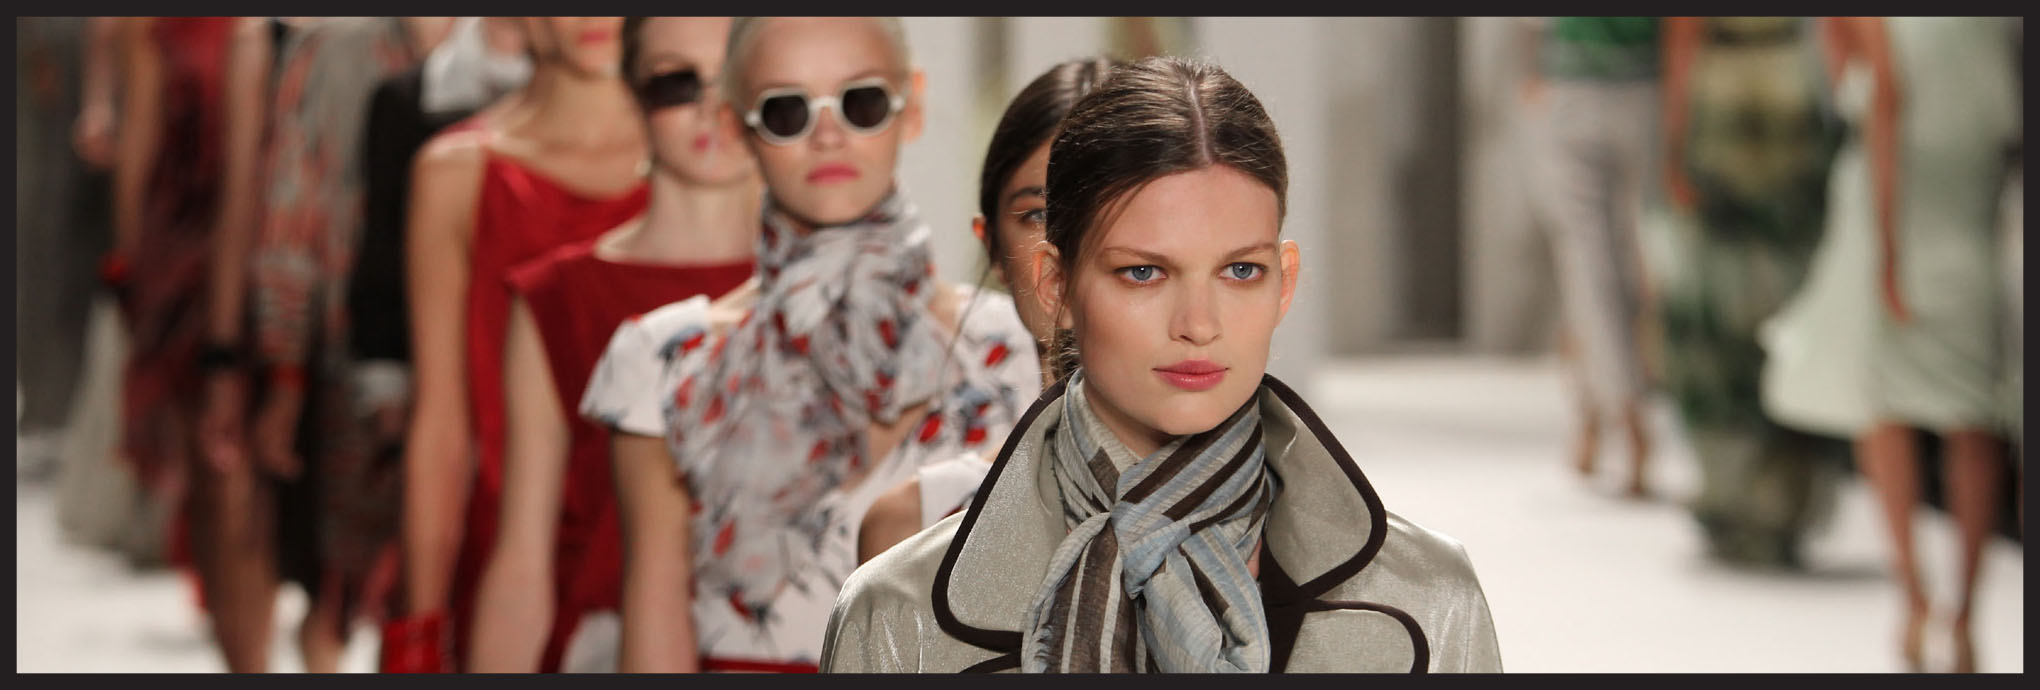 WMI_Fashion_Header_2-1.jpg